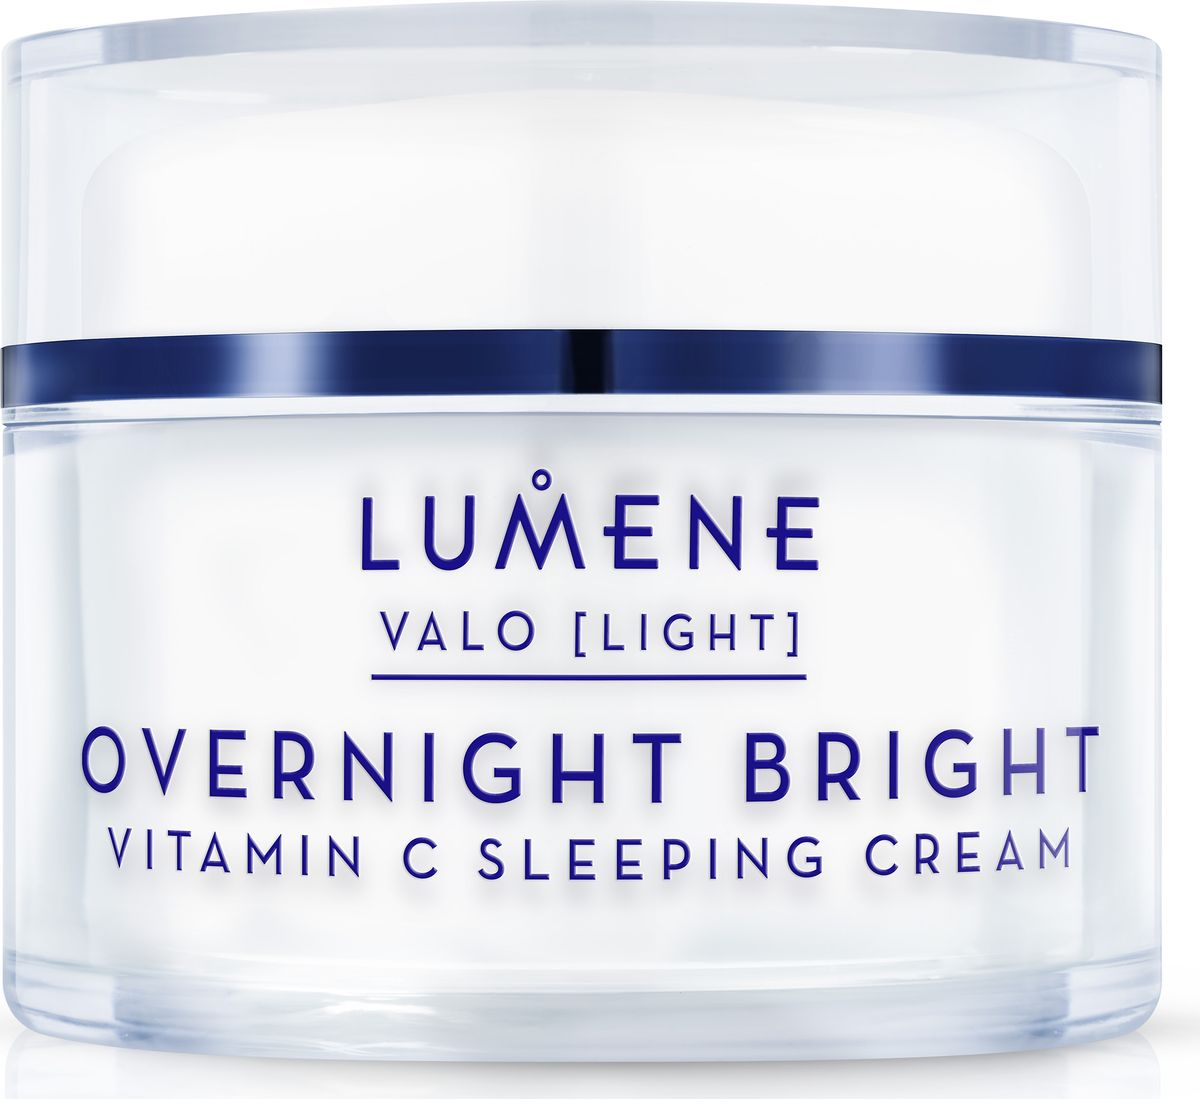 Lumene Valo Восстанавливающий крем-сон Vitamin C, 50 мл lumene lahde hydration recharge overnight cream крем ночной увлажняющий восстанавливающий 50 мл